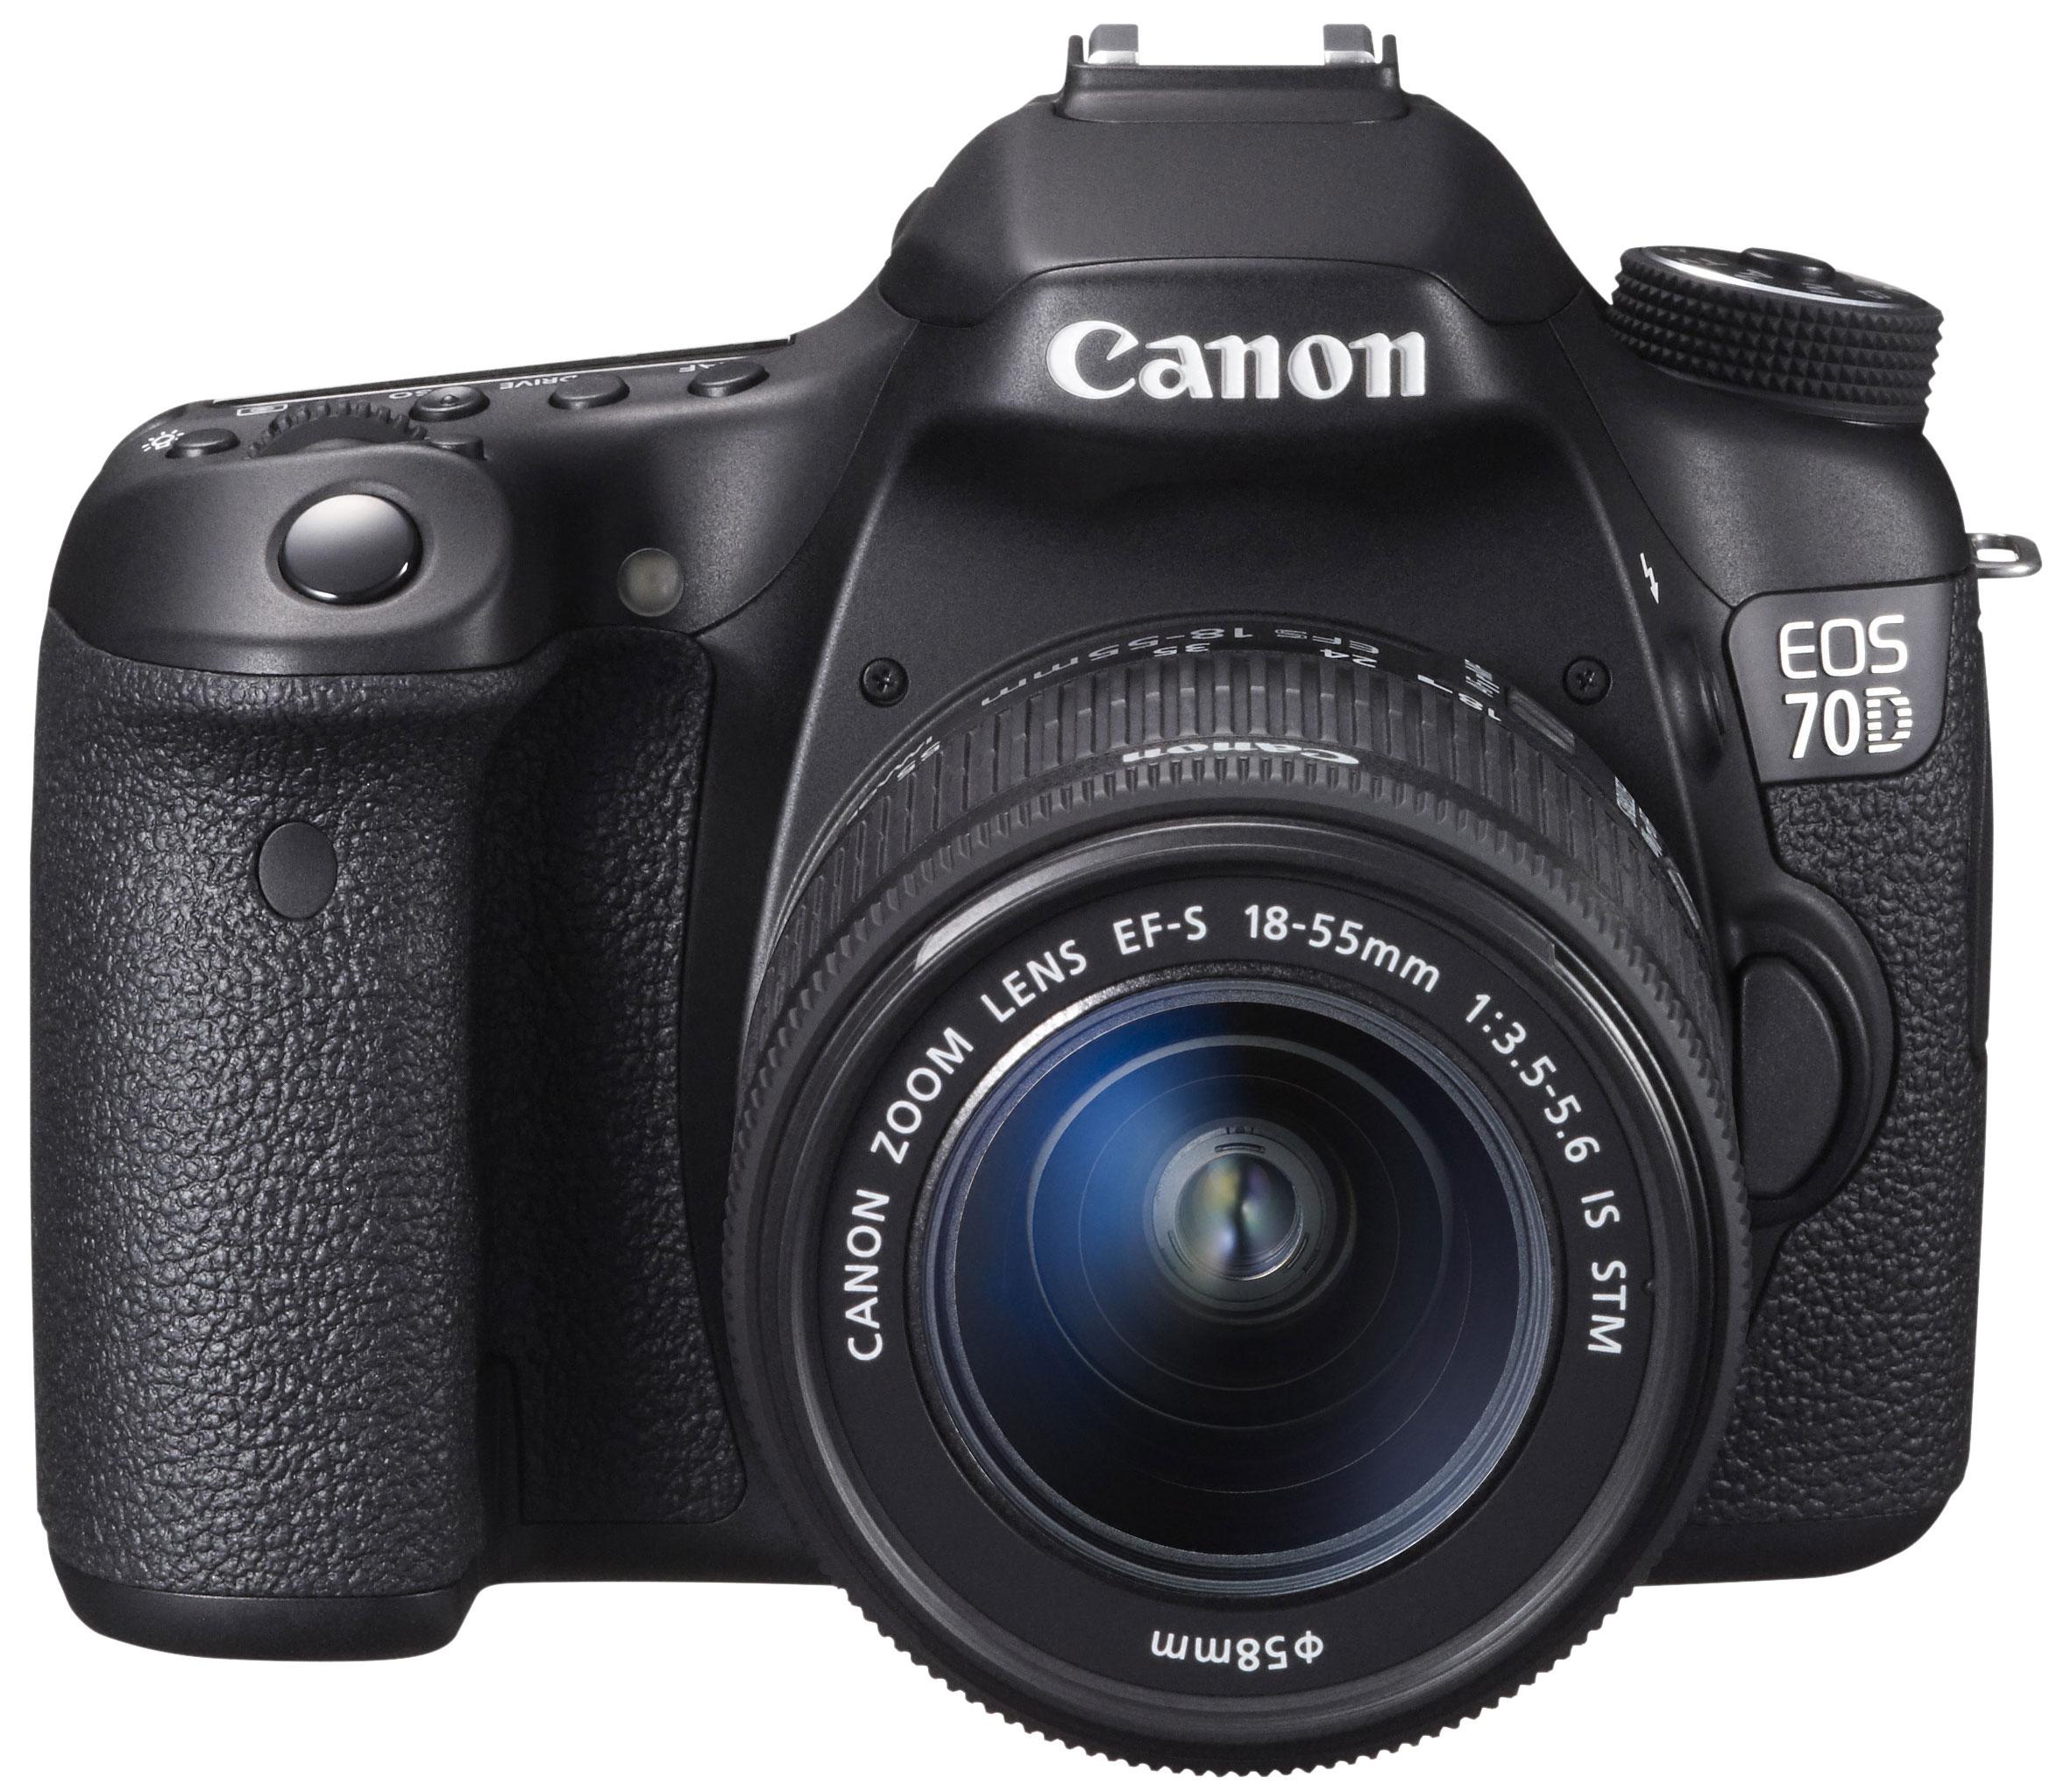 Camera Canon 20da Dslr Camera canon eos 20da dslr images guru d dslr